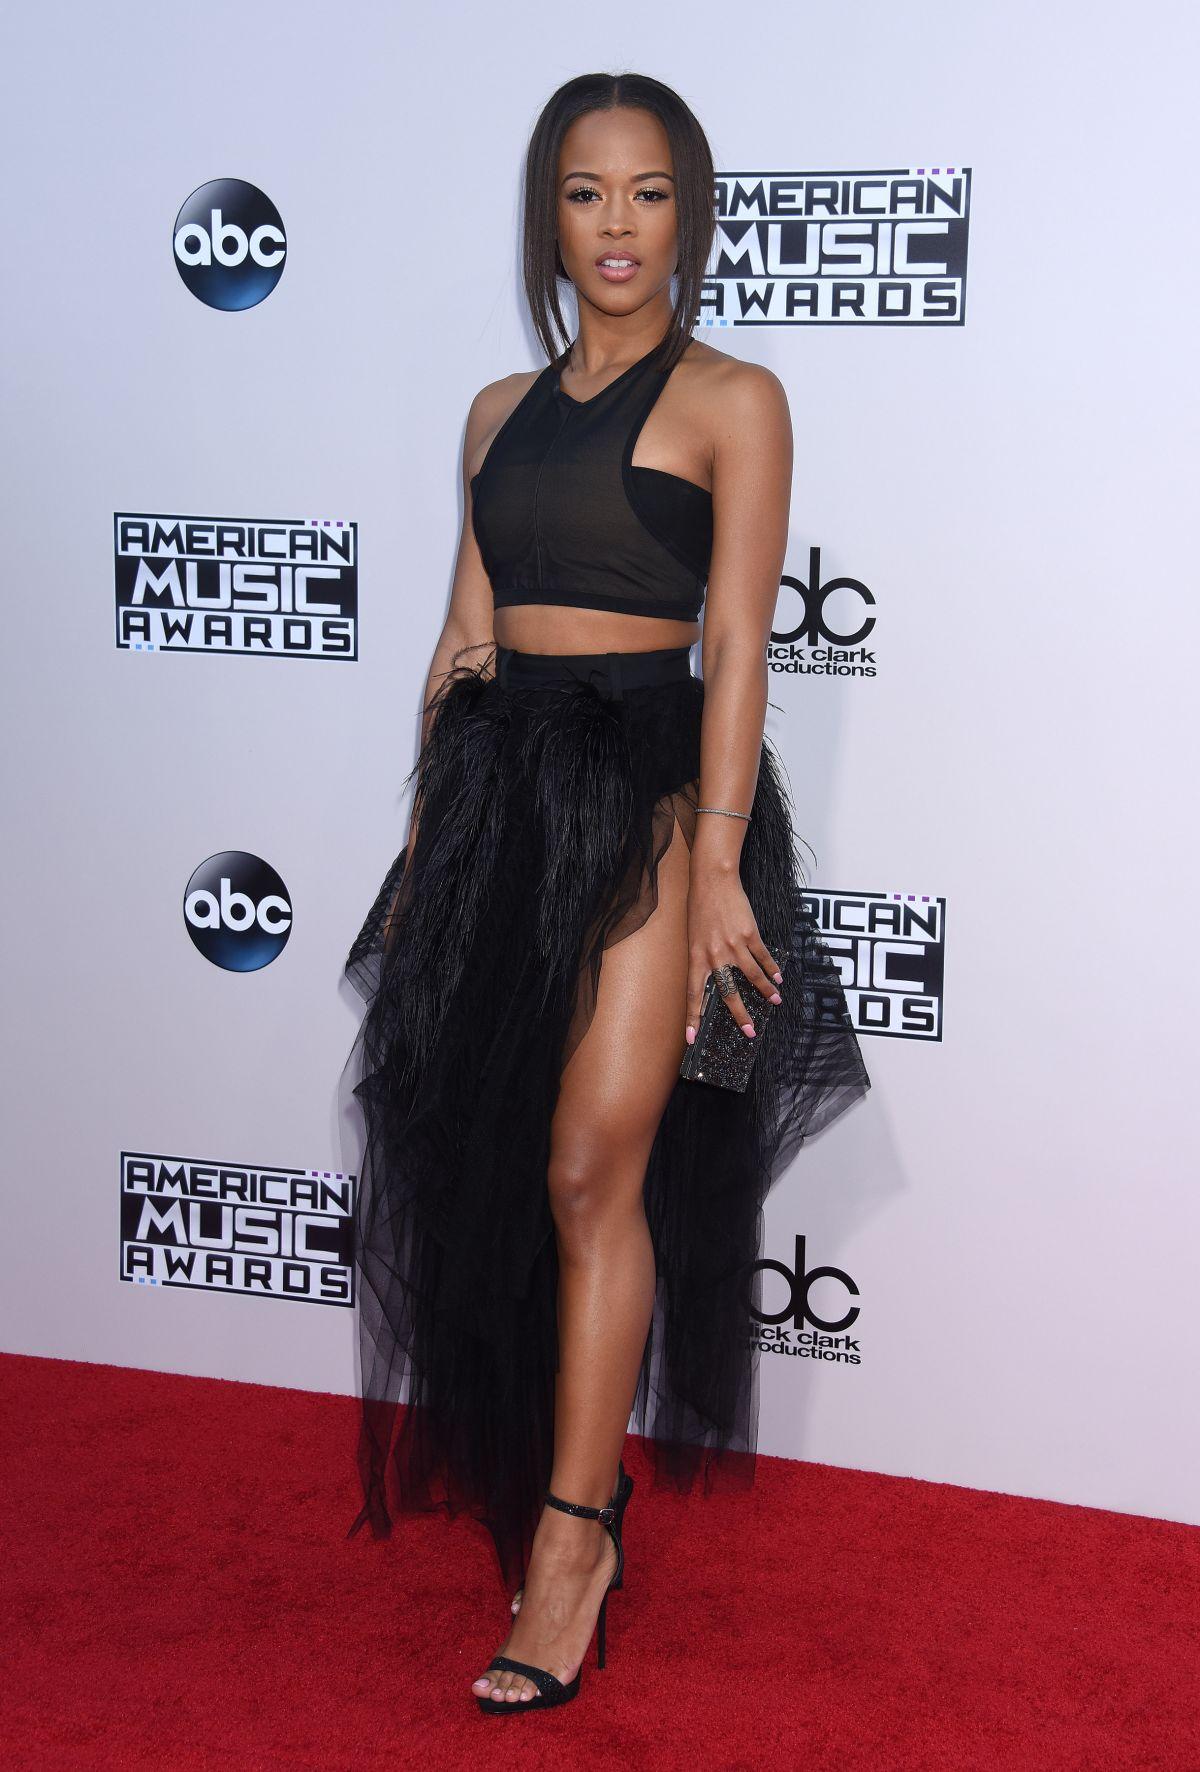 SERAYAH MCNEILL at 2015 American Music Awards in Los Angeles 11/22/2015